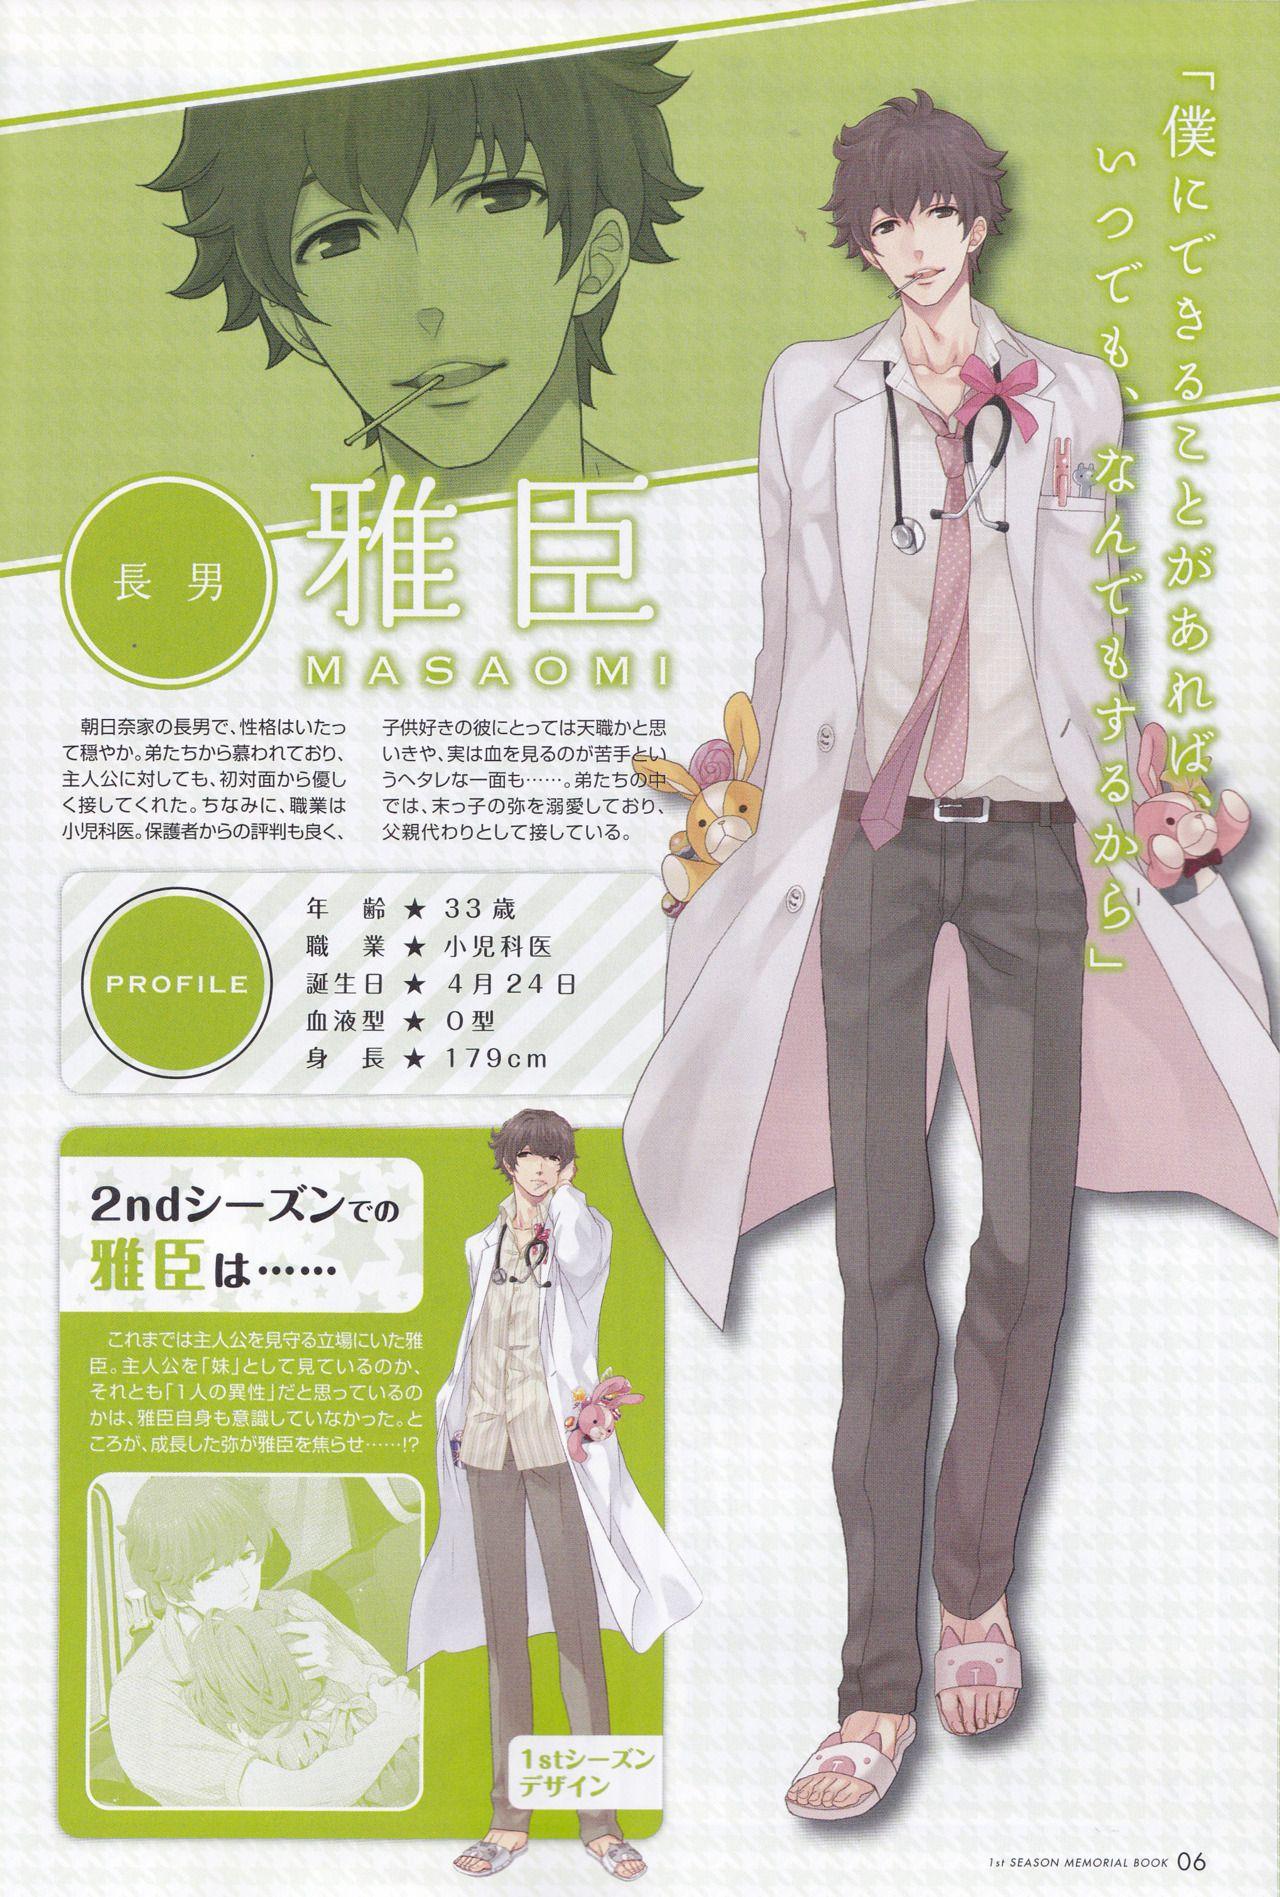 Brothers Conflict Season 2 Manga Volume 5 - Masomi Asahina  Brothers conflict, Anime, Brothers conflict season 2 Manga Art Style